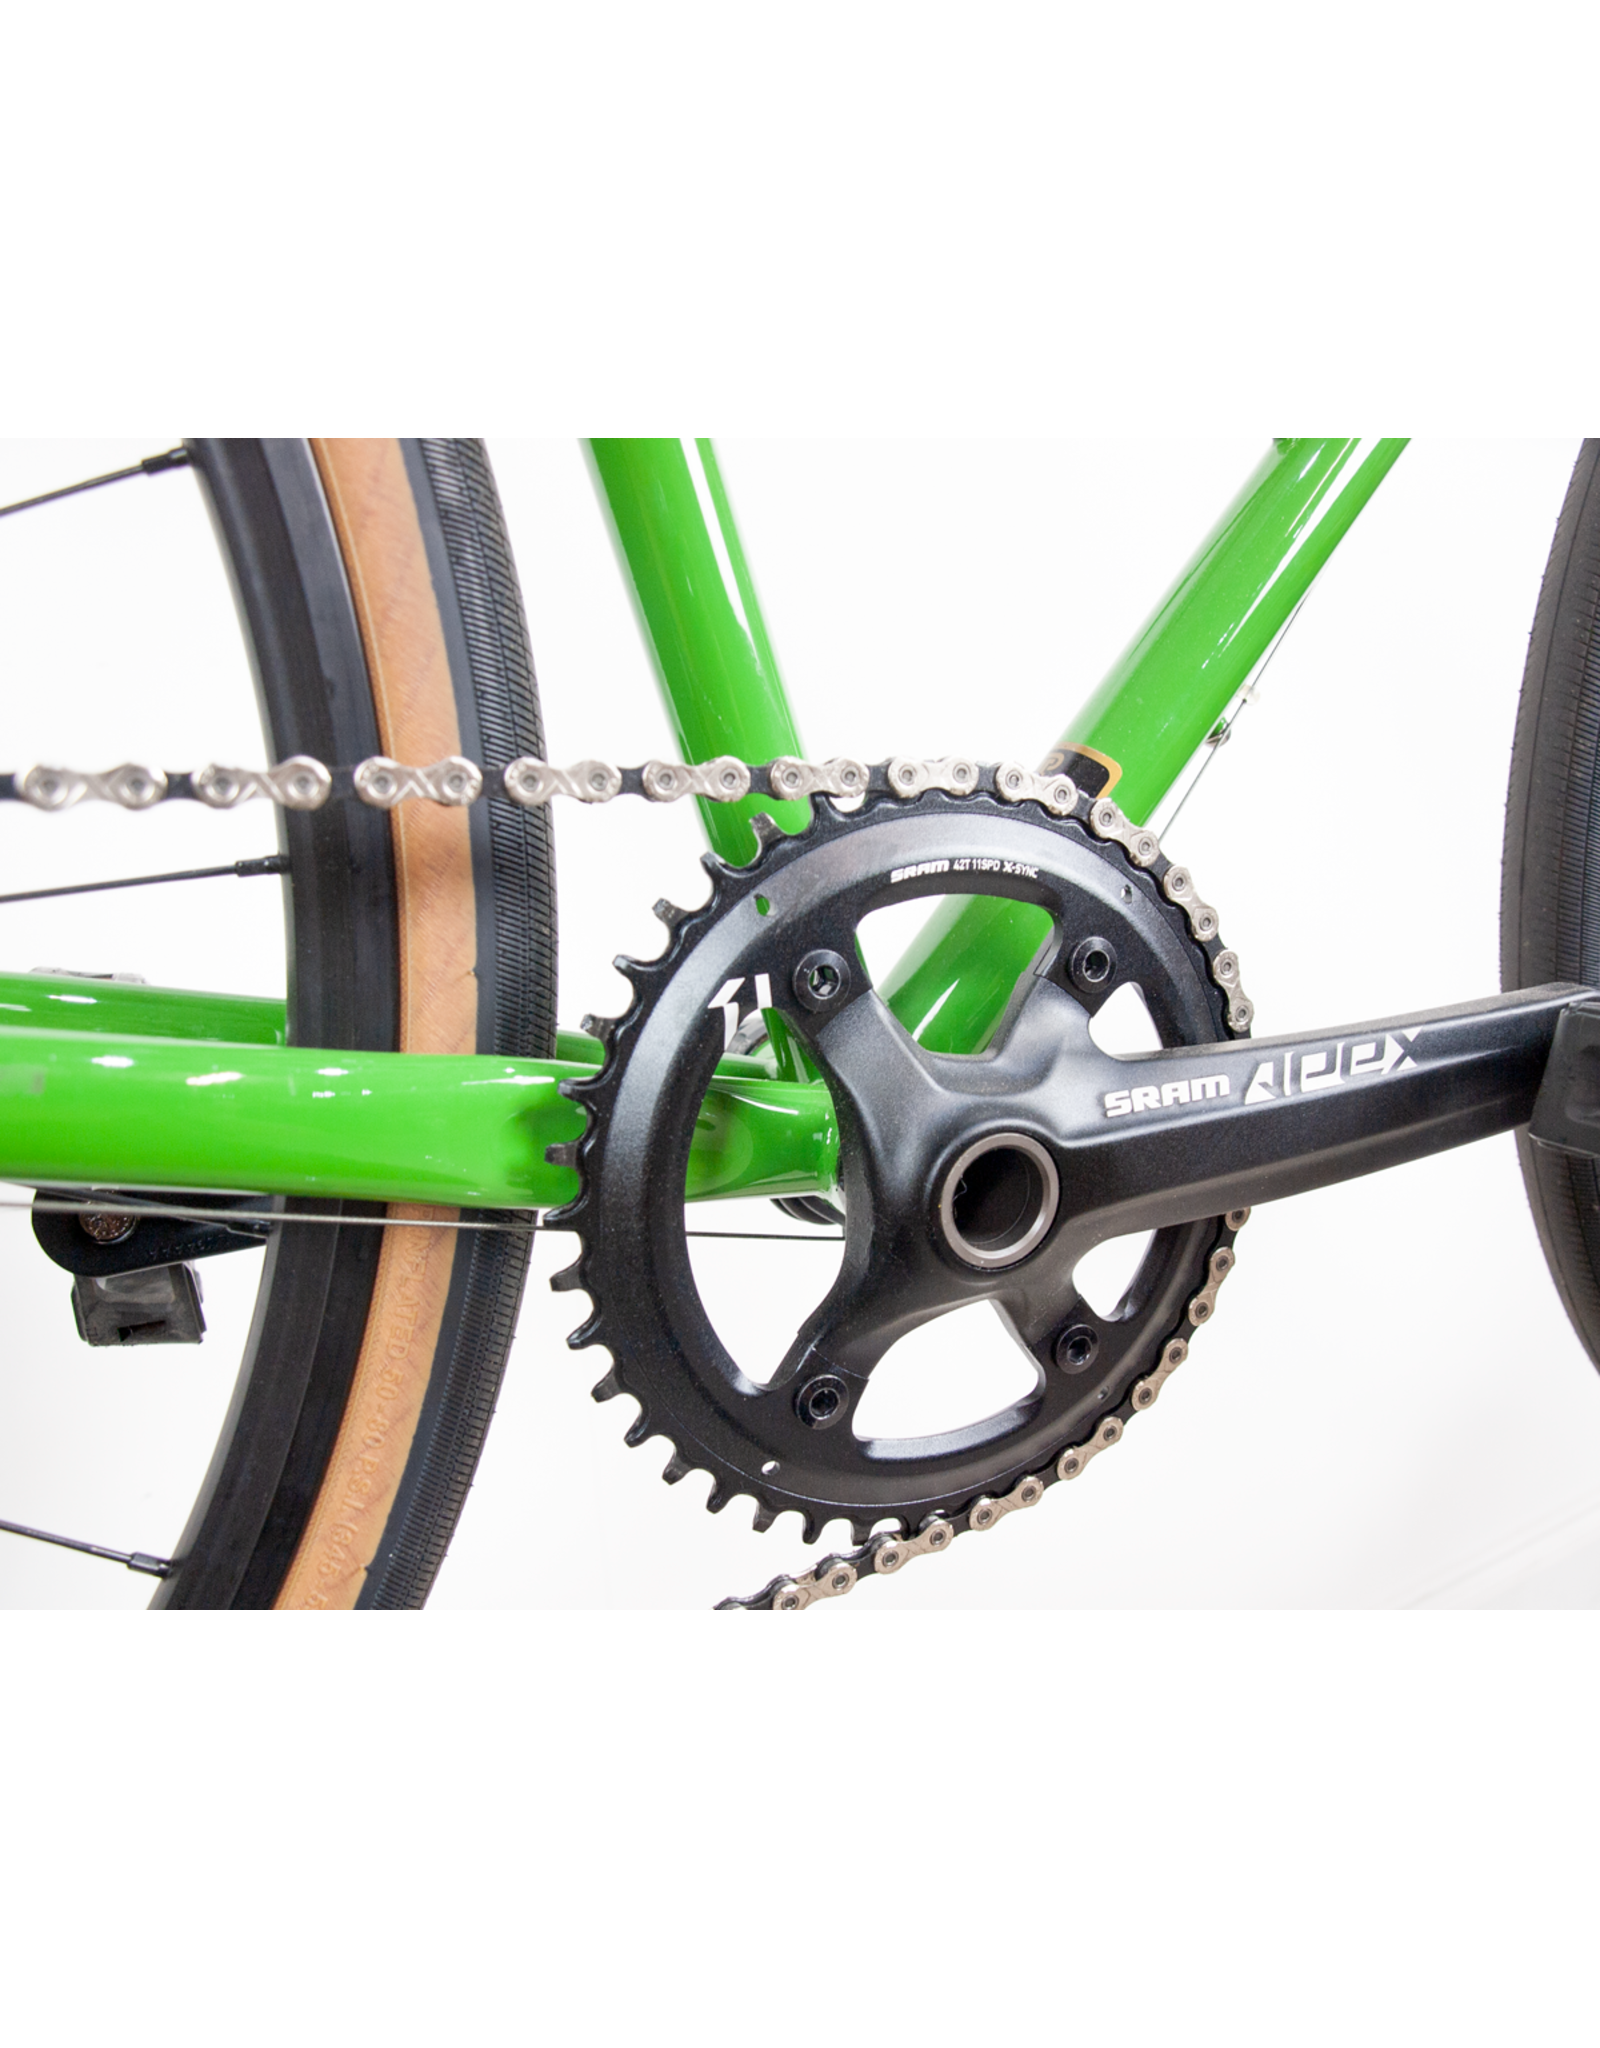 Seabass cycles x Soma wolverine shopfloor build - 54cm